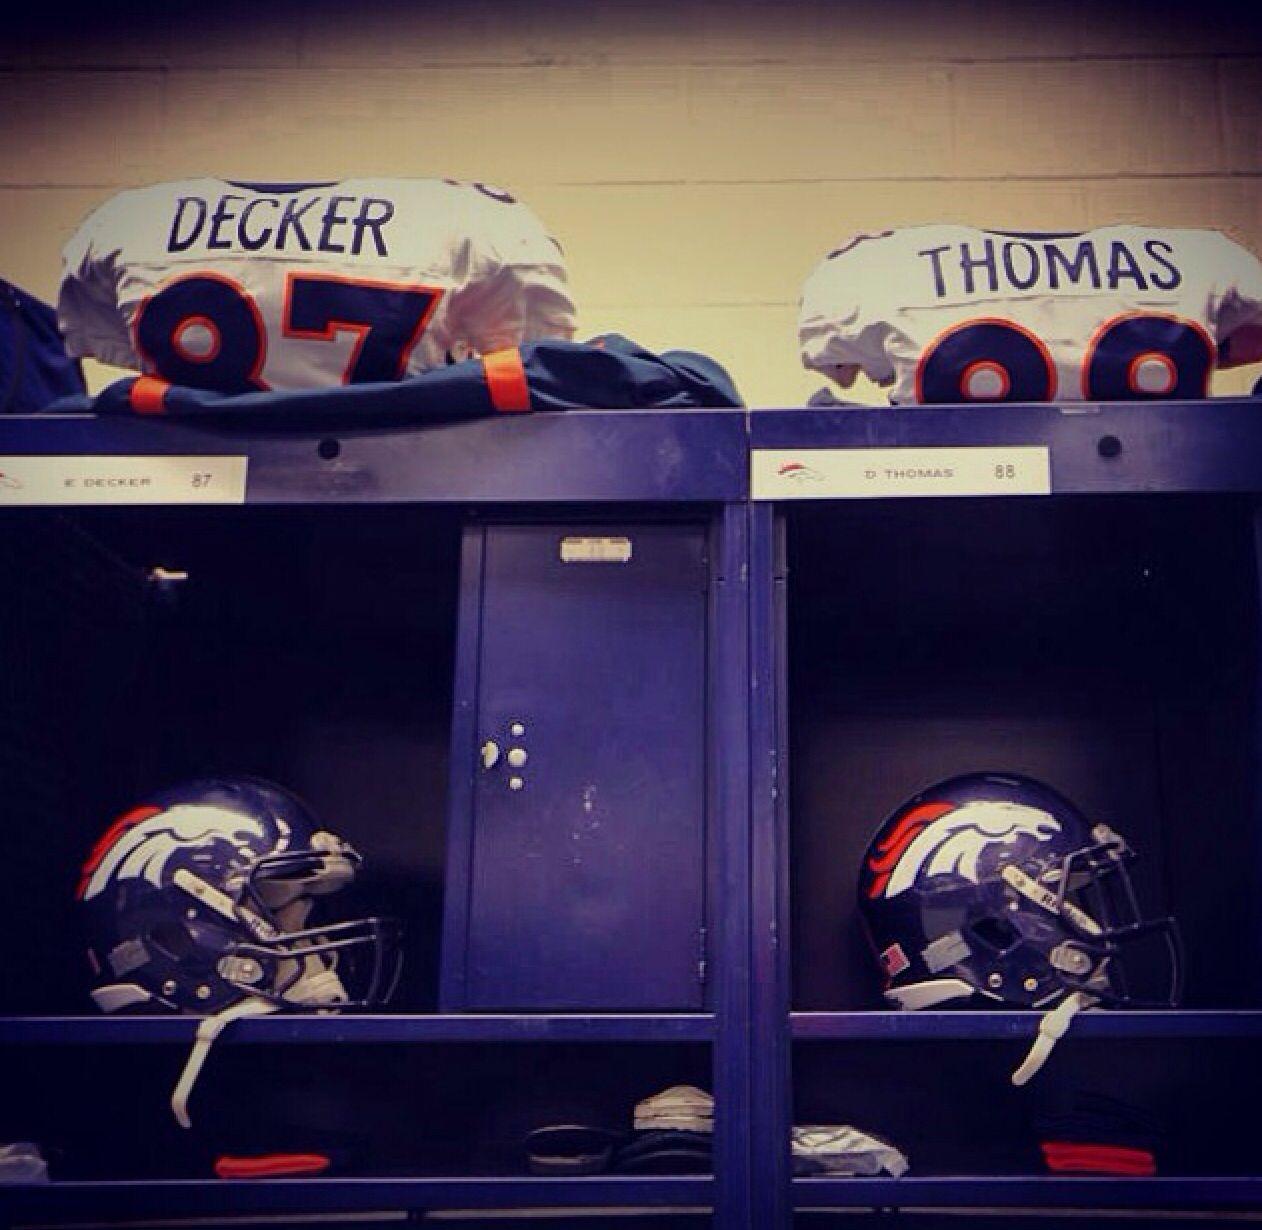 Denver broncos texans locker room dec 2013 denver